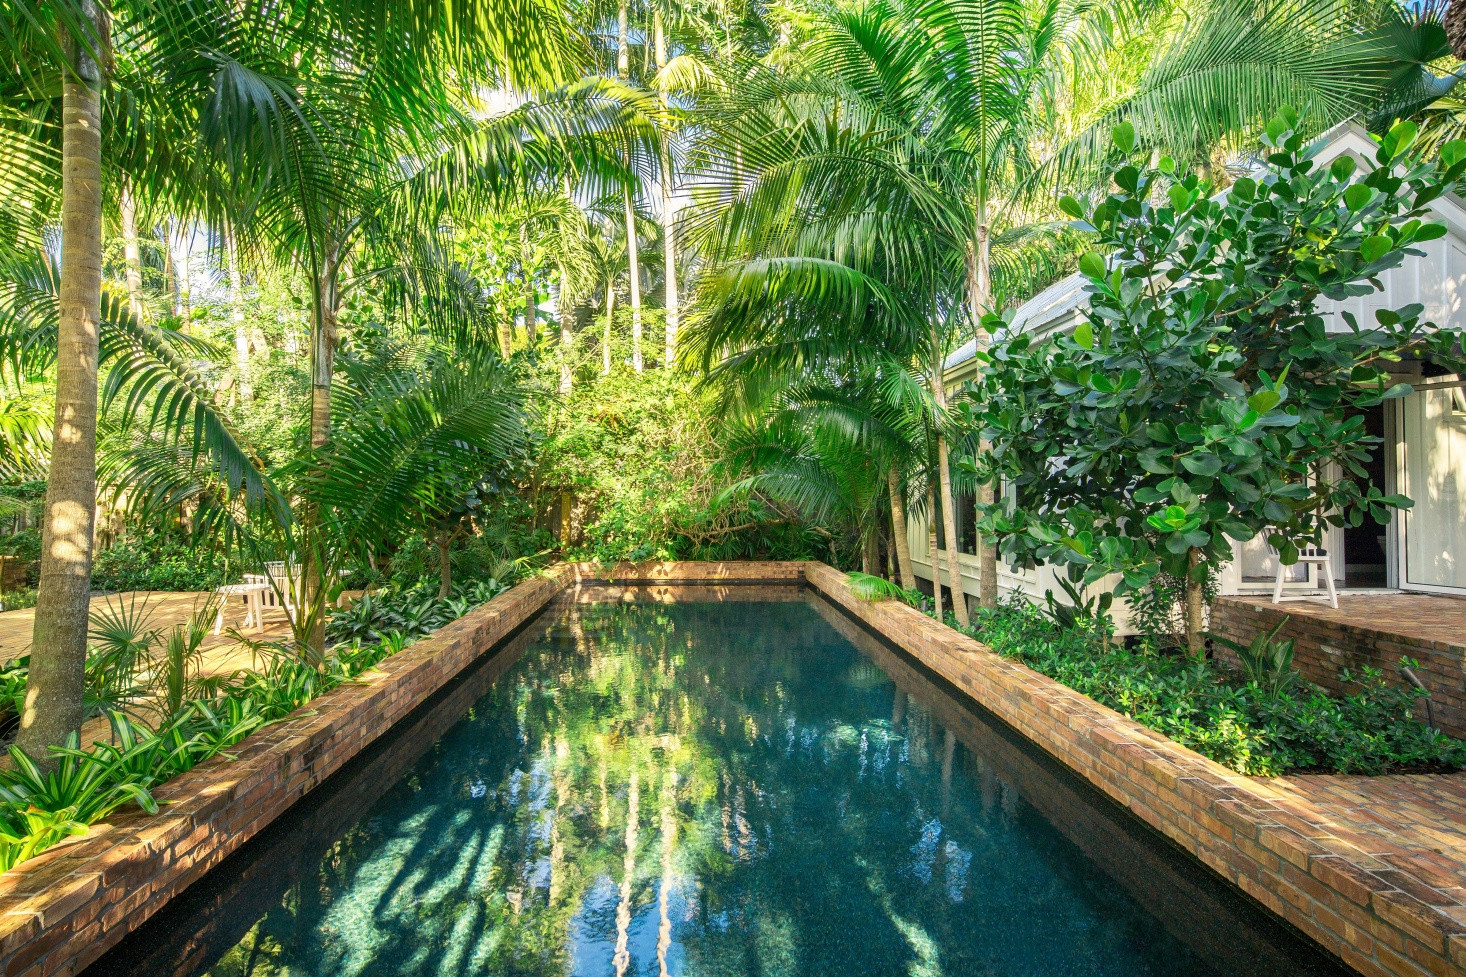 Outdoor Landscape Tropical  Key West Landscape Architecture How to Design a Tropical